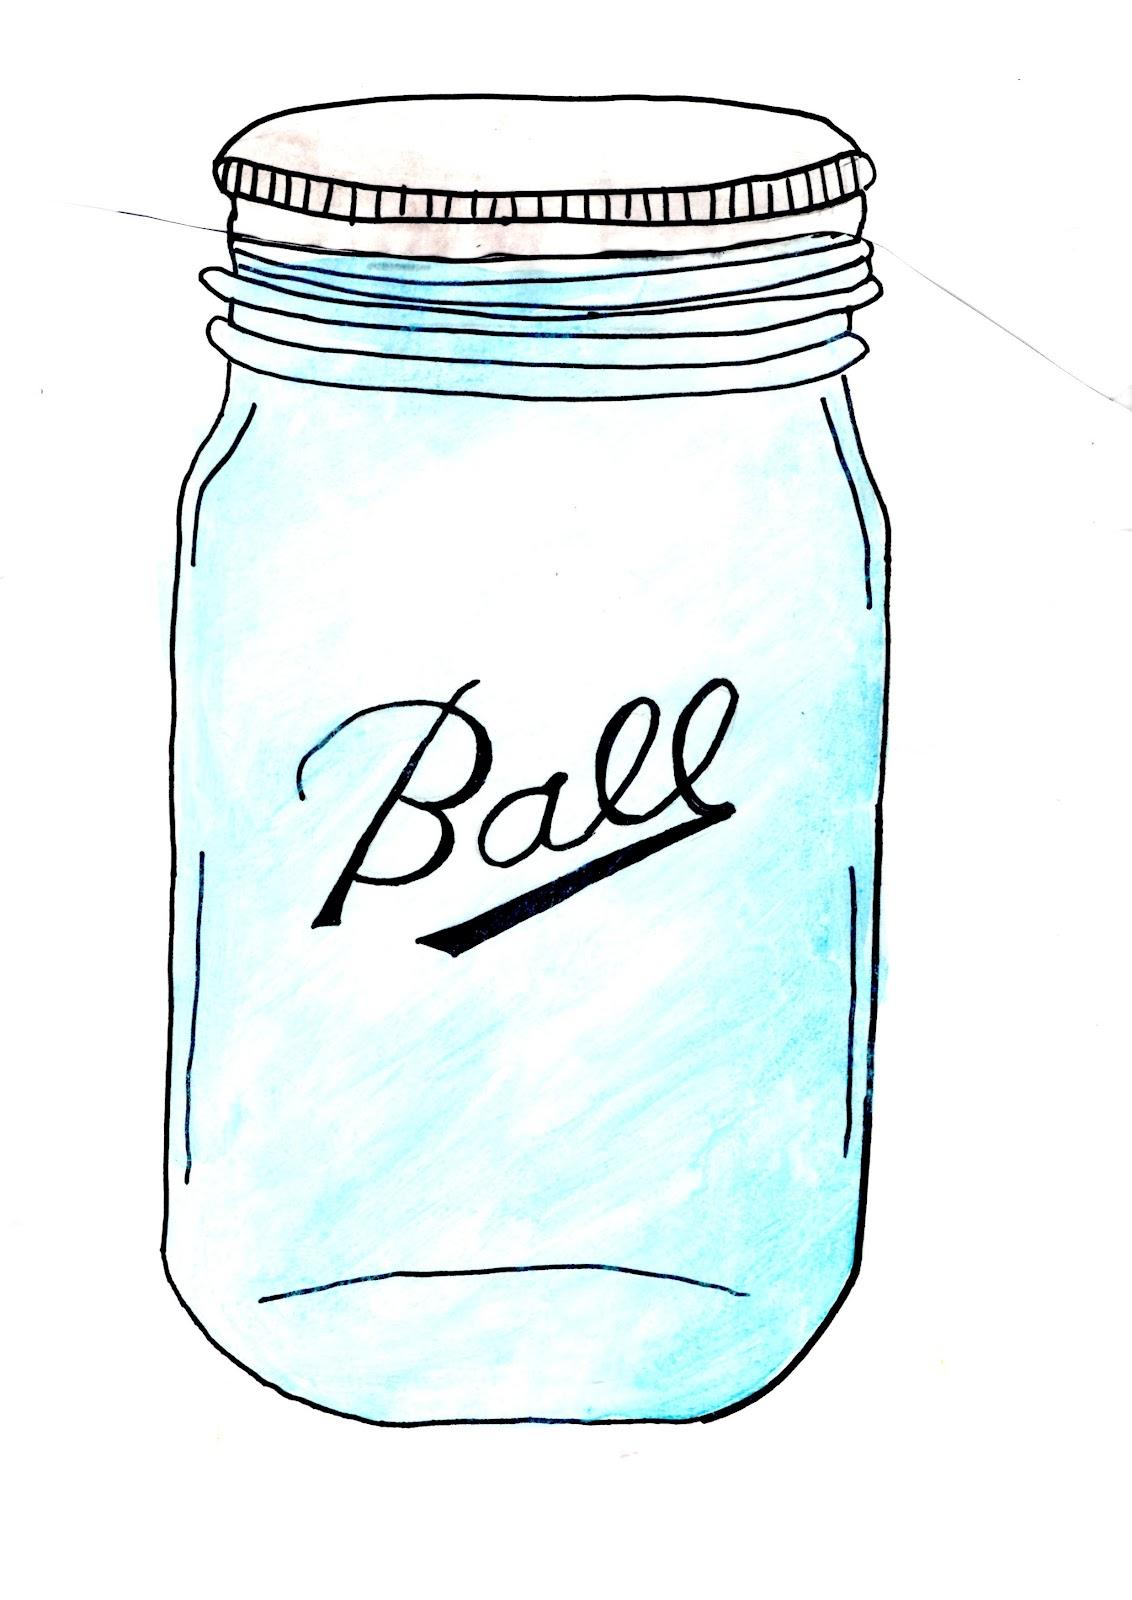 Jam clipart jar lid Free art jar art Clip